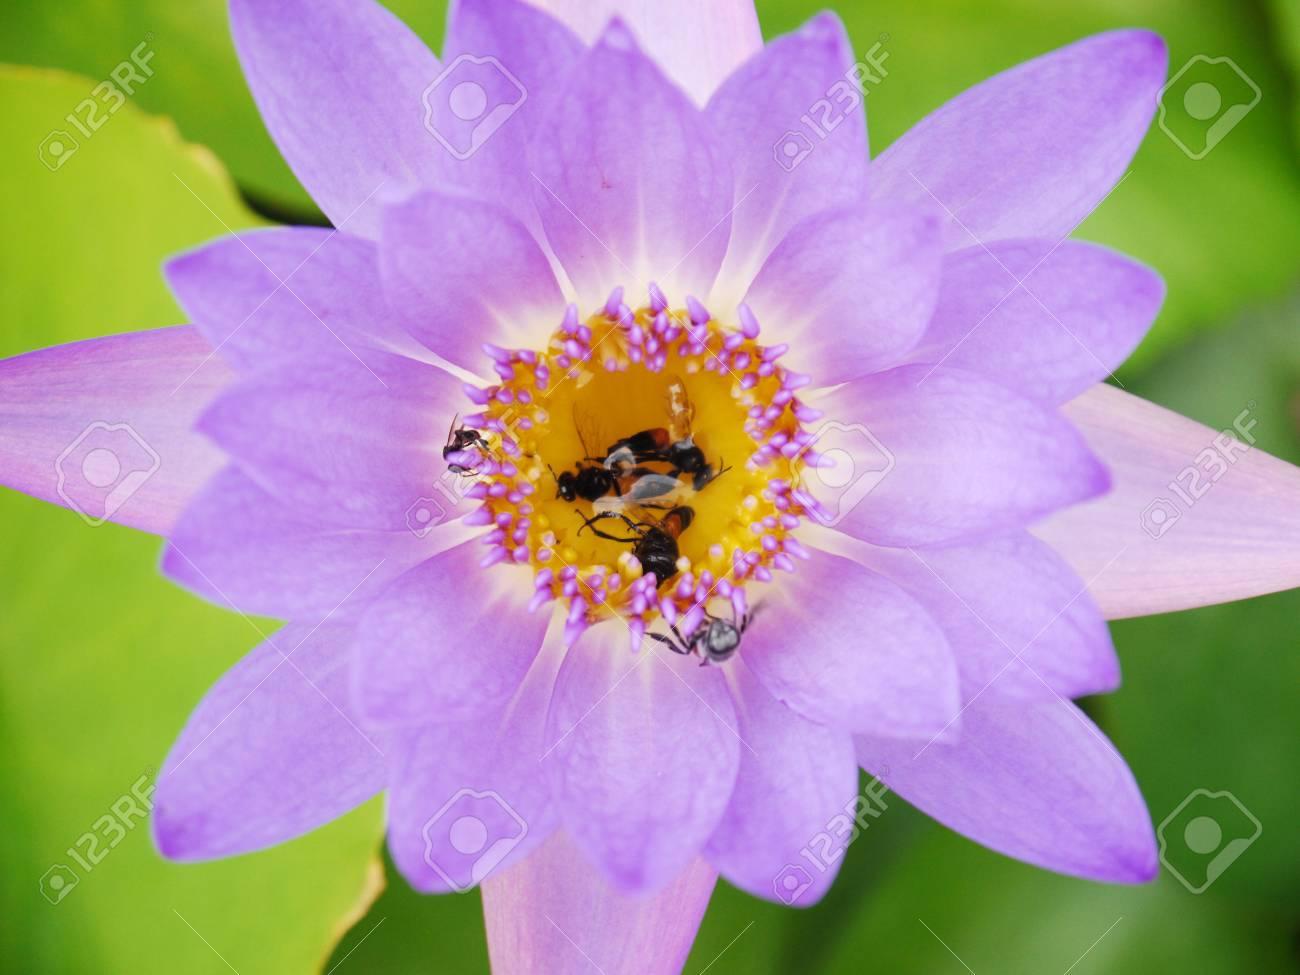 Closeup dead bees on purple lotus stock photo picture and royalty closeup dead bees on purple lotus stock photo 47753516 izmirmasajfo